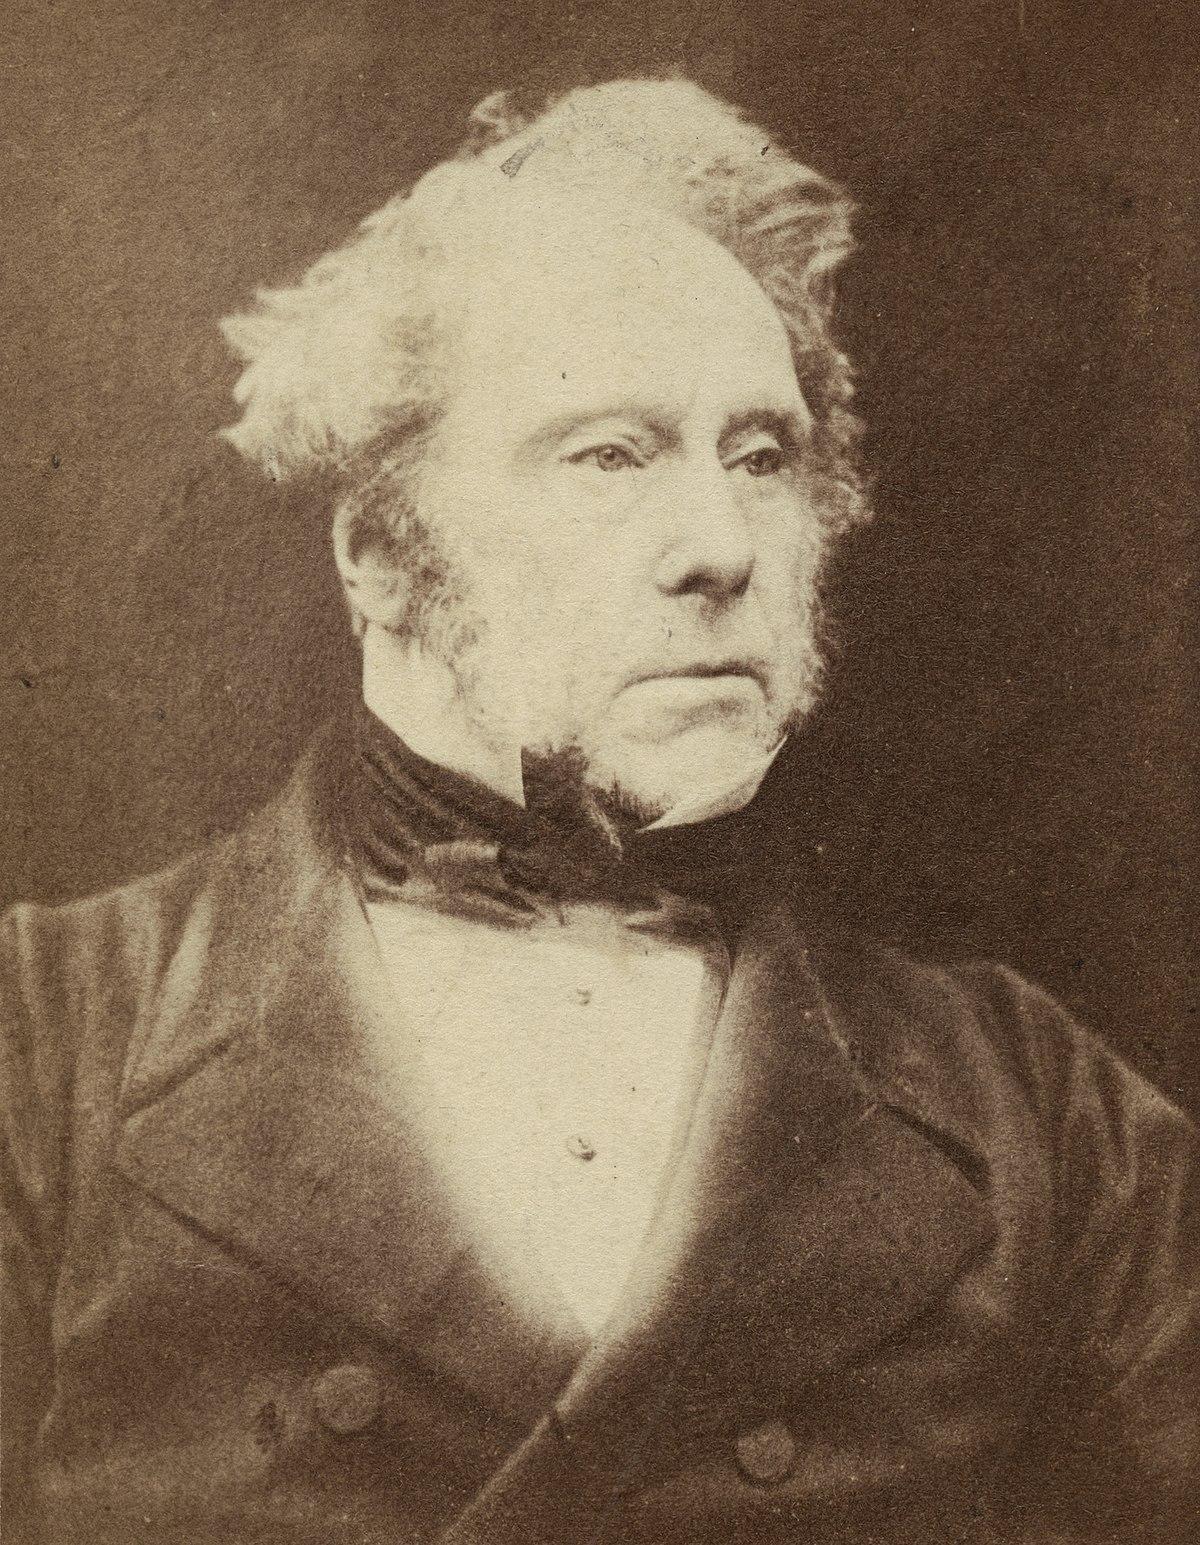 Henry John Temple, 3rd Viscount Palmerston - Wikipedia